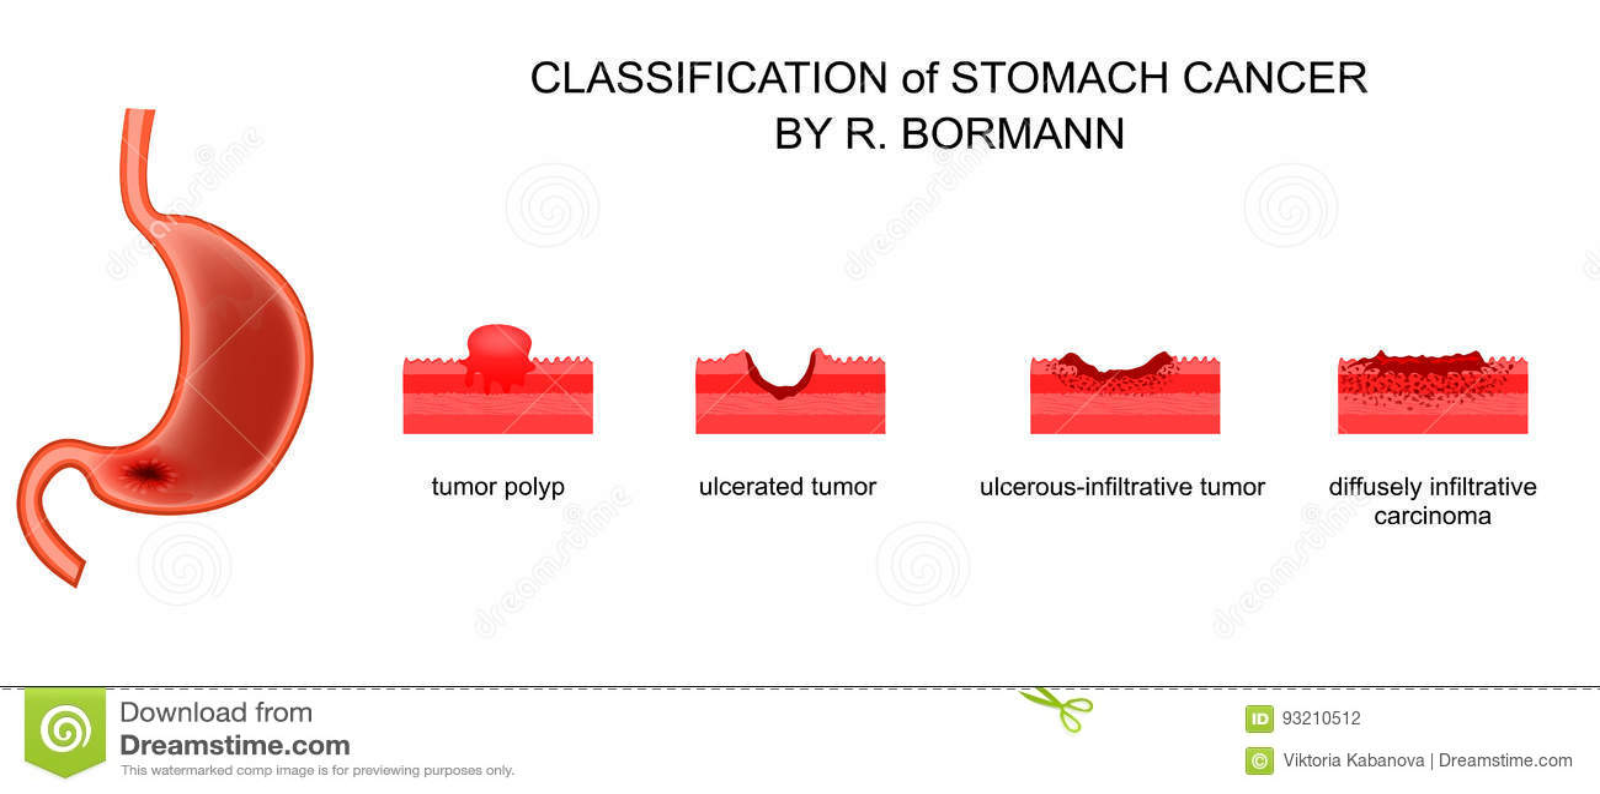 gastric cancer borrmann